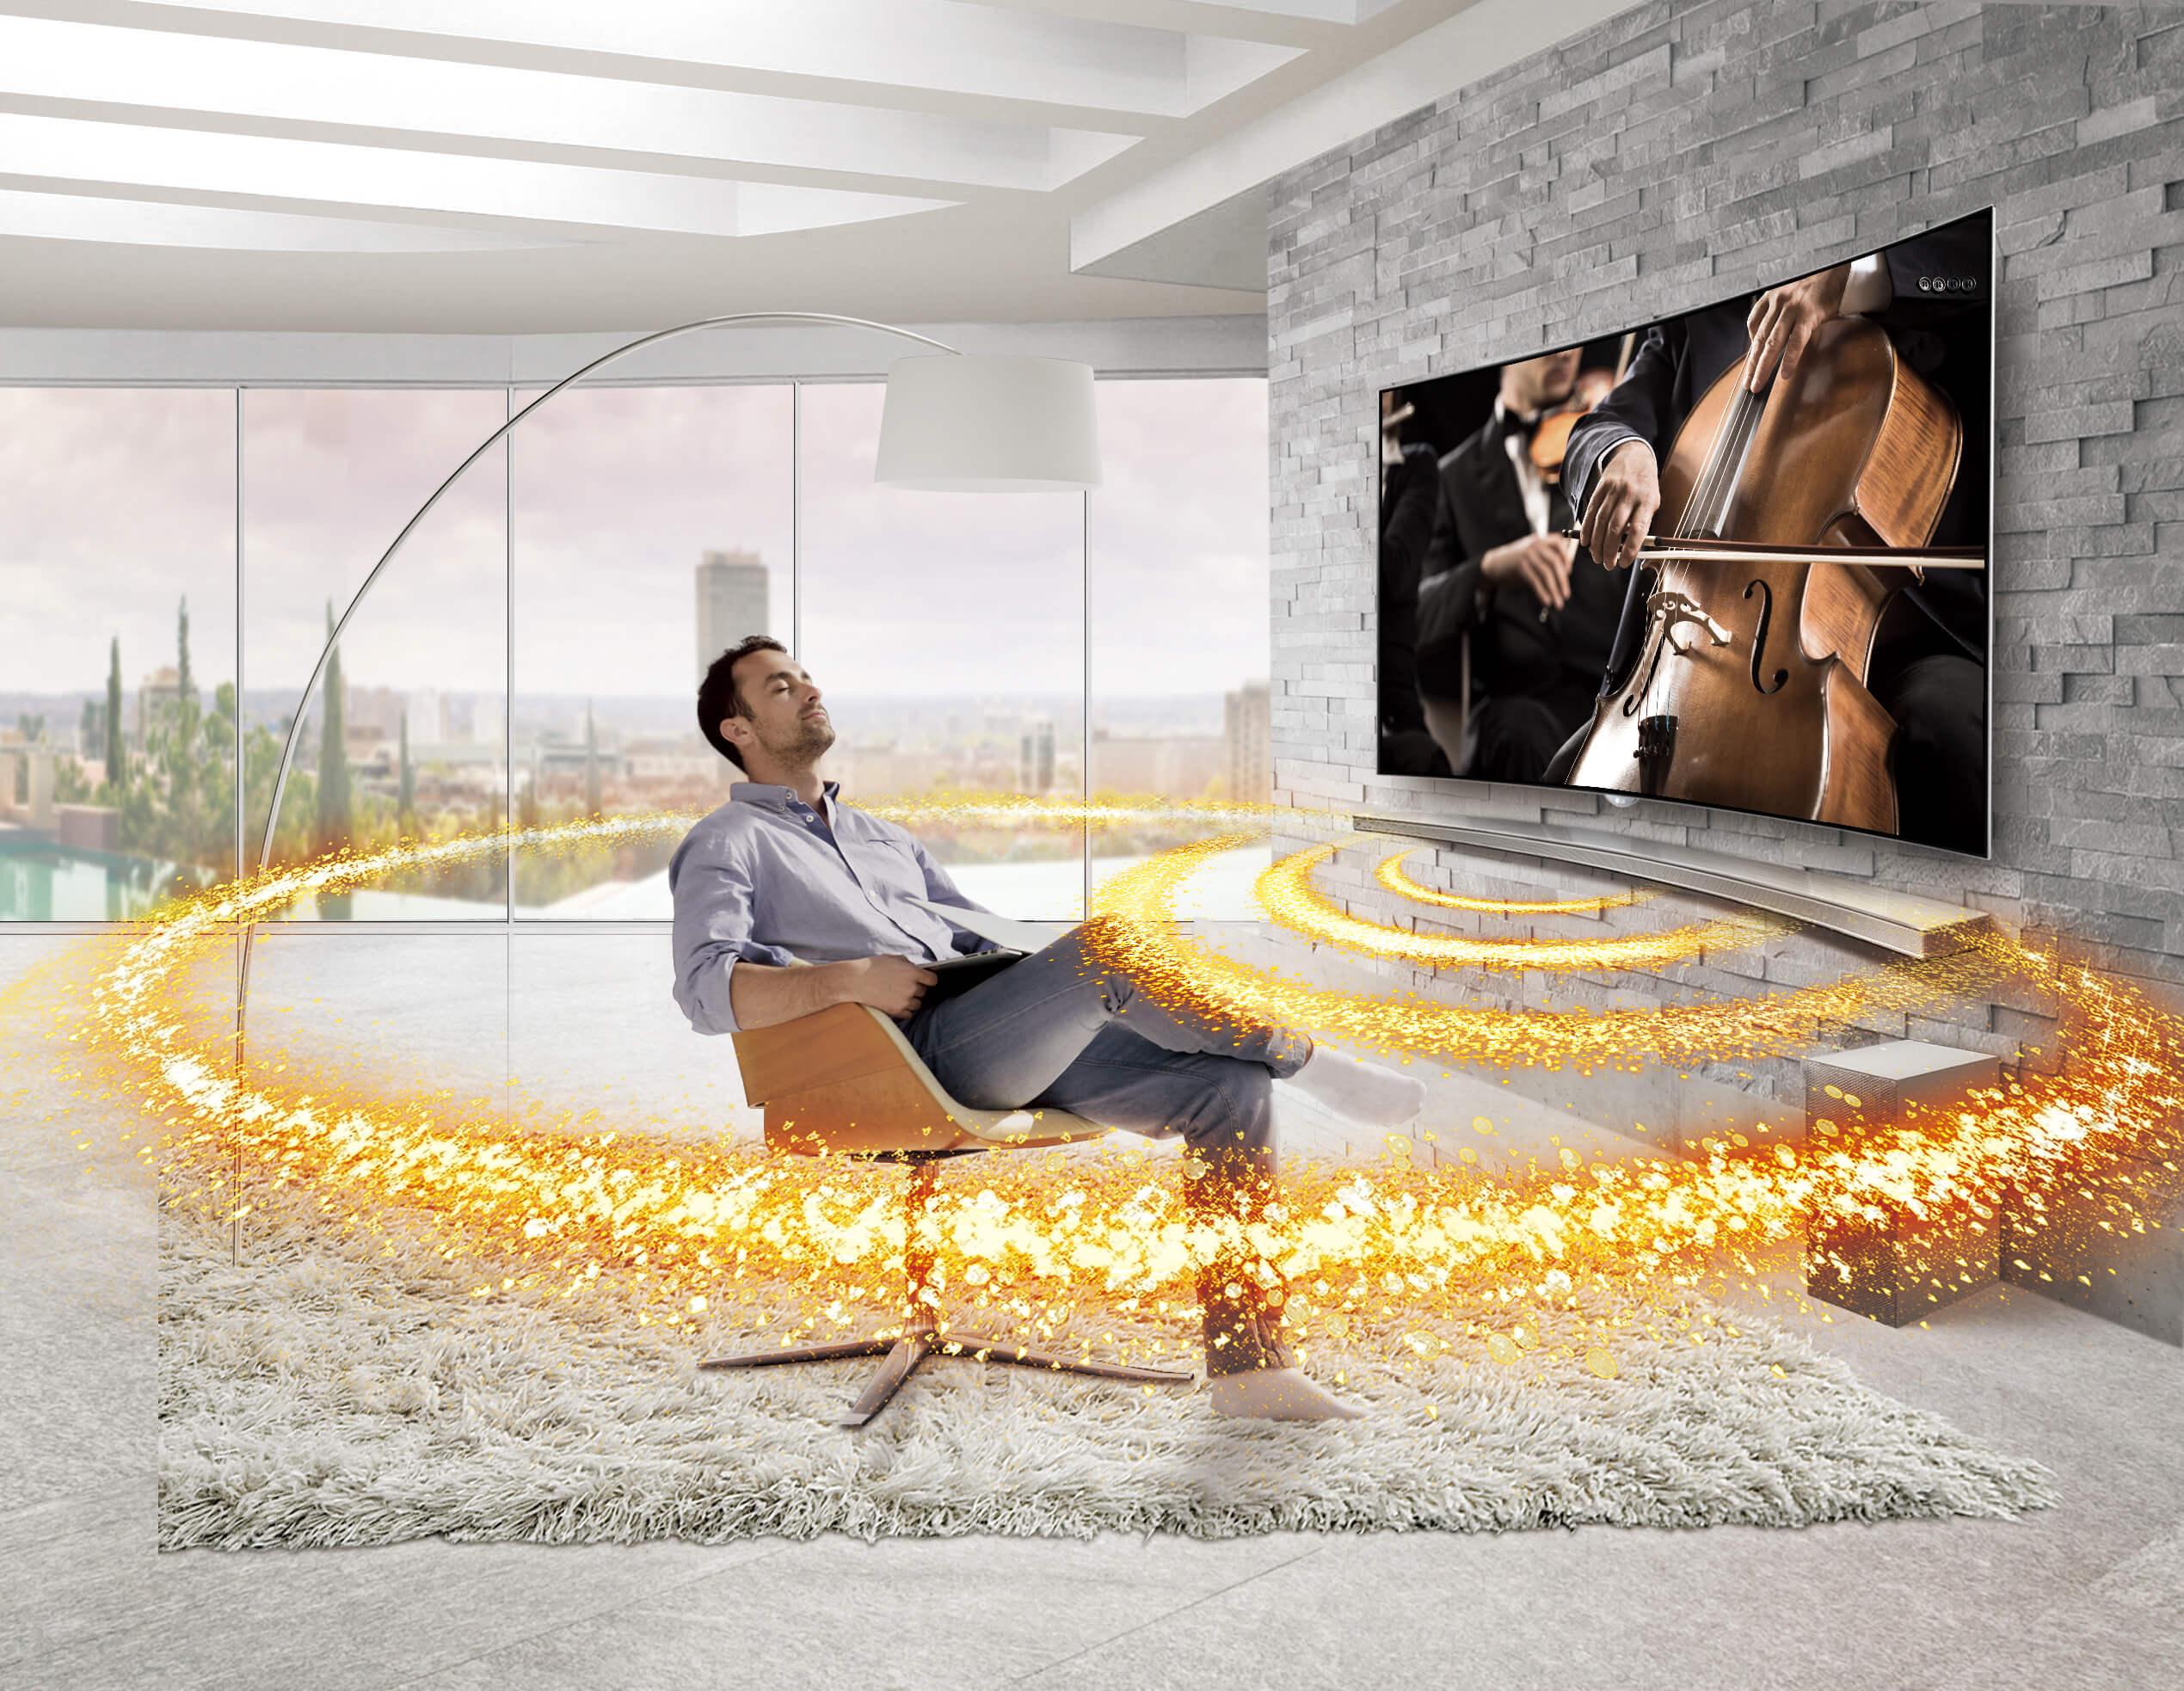 The new range of soundbars from Yamaha, Sony, Samsung, and LG produce lifelike sound.